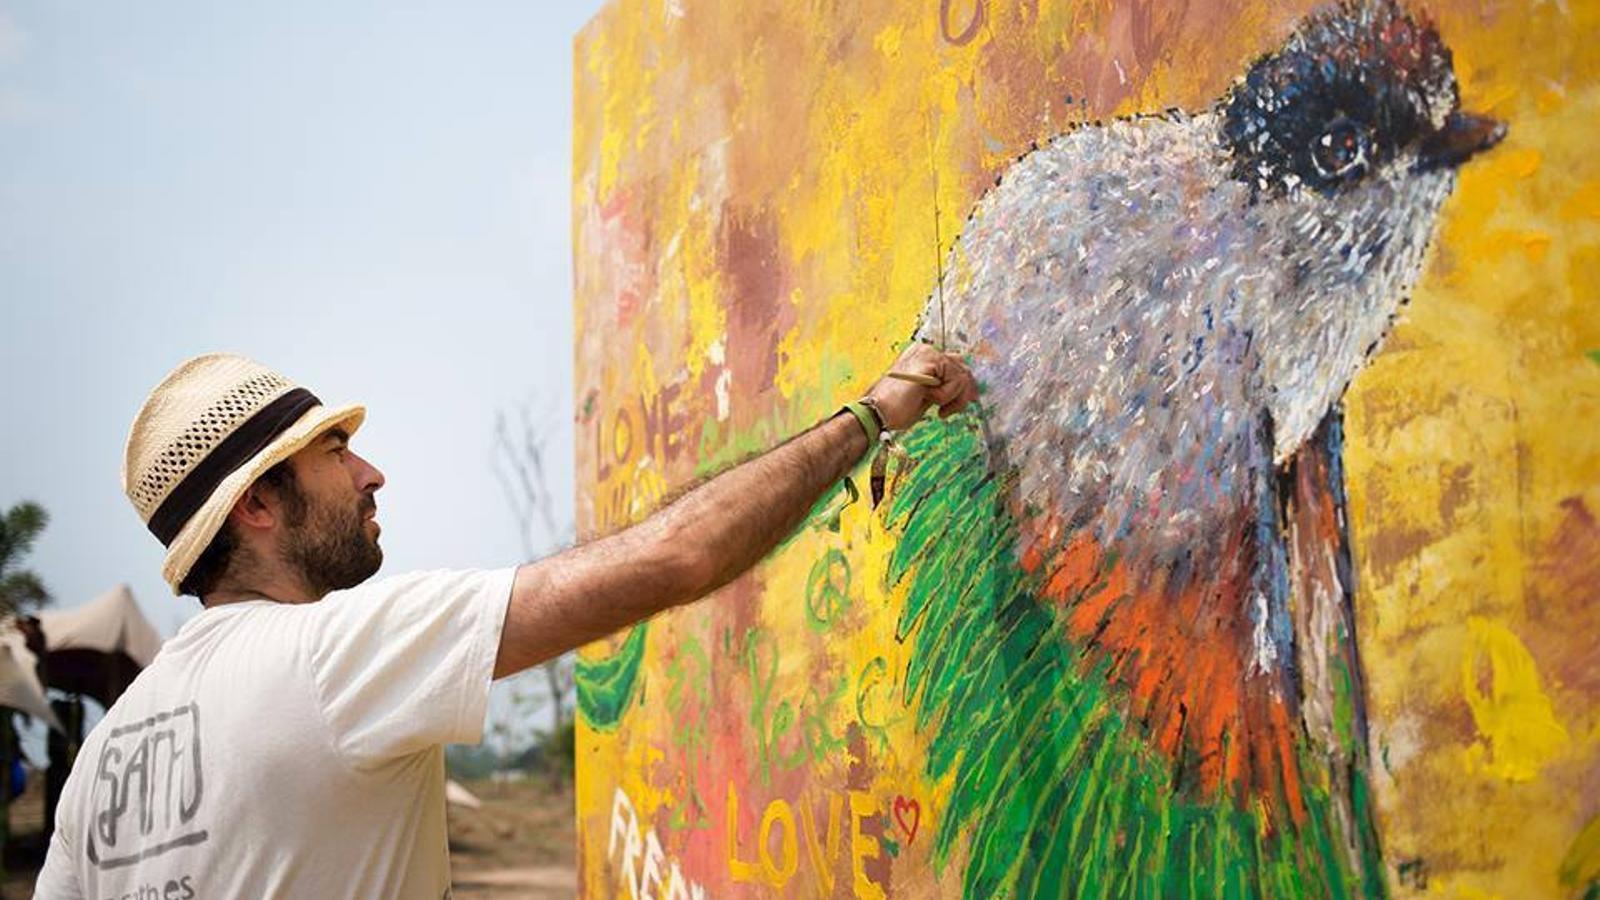 Sandro Thomàs 'Sath' pinta somriures a través de l'art urbà